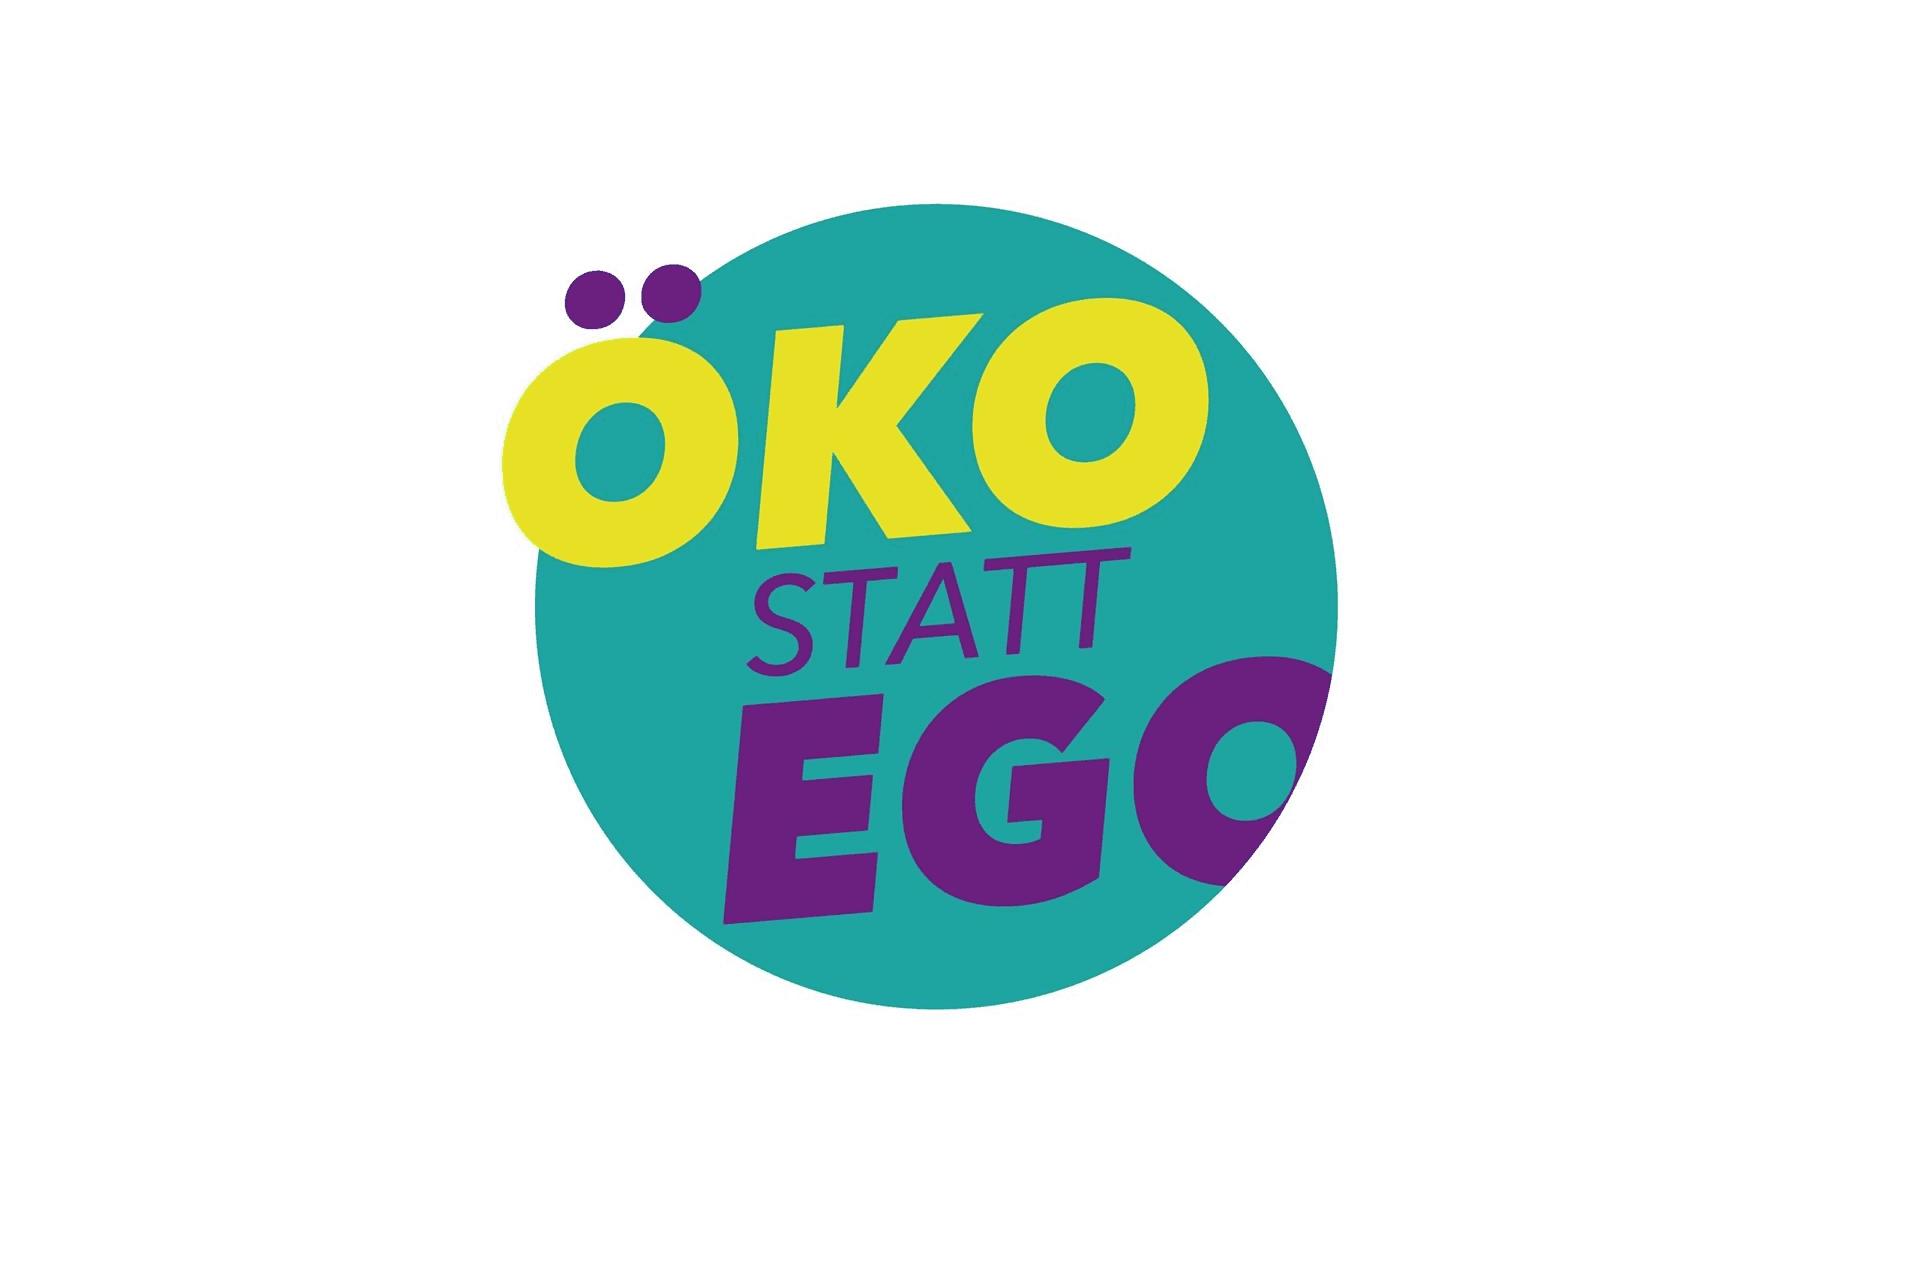 Logo Oeko statt ego